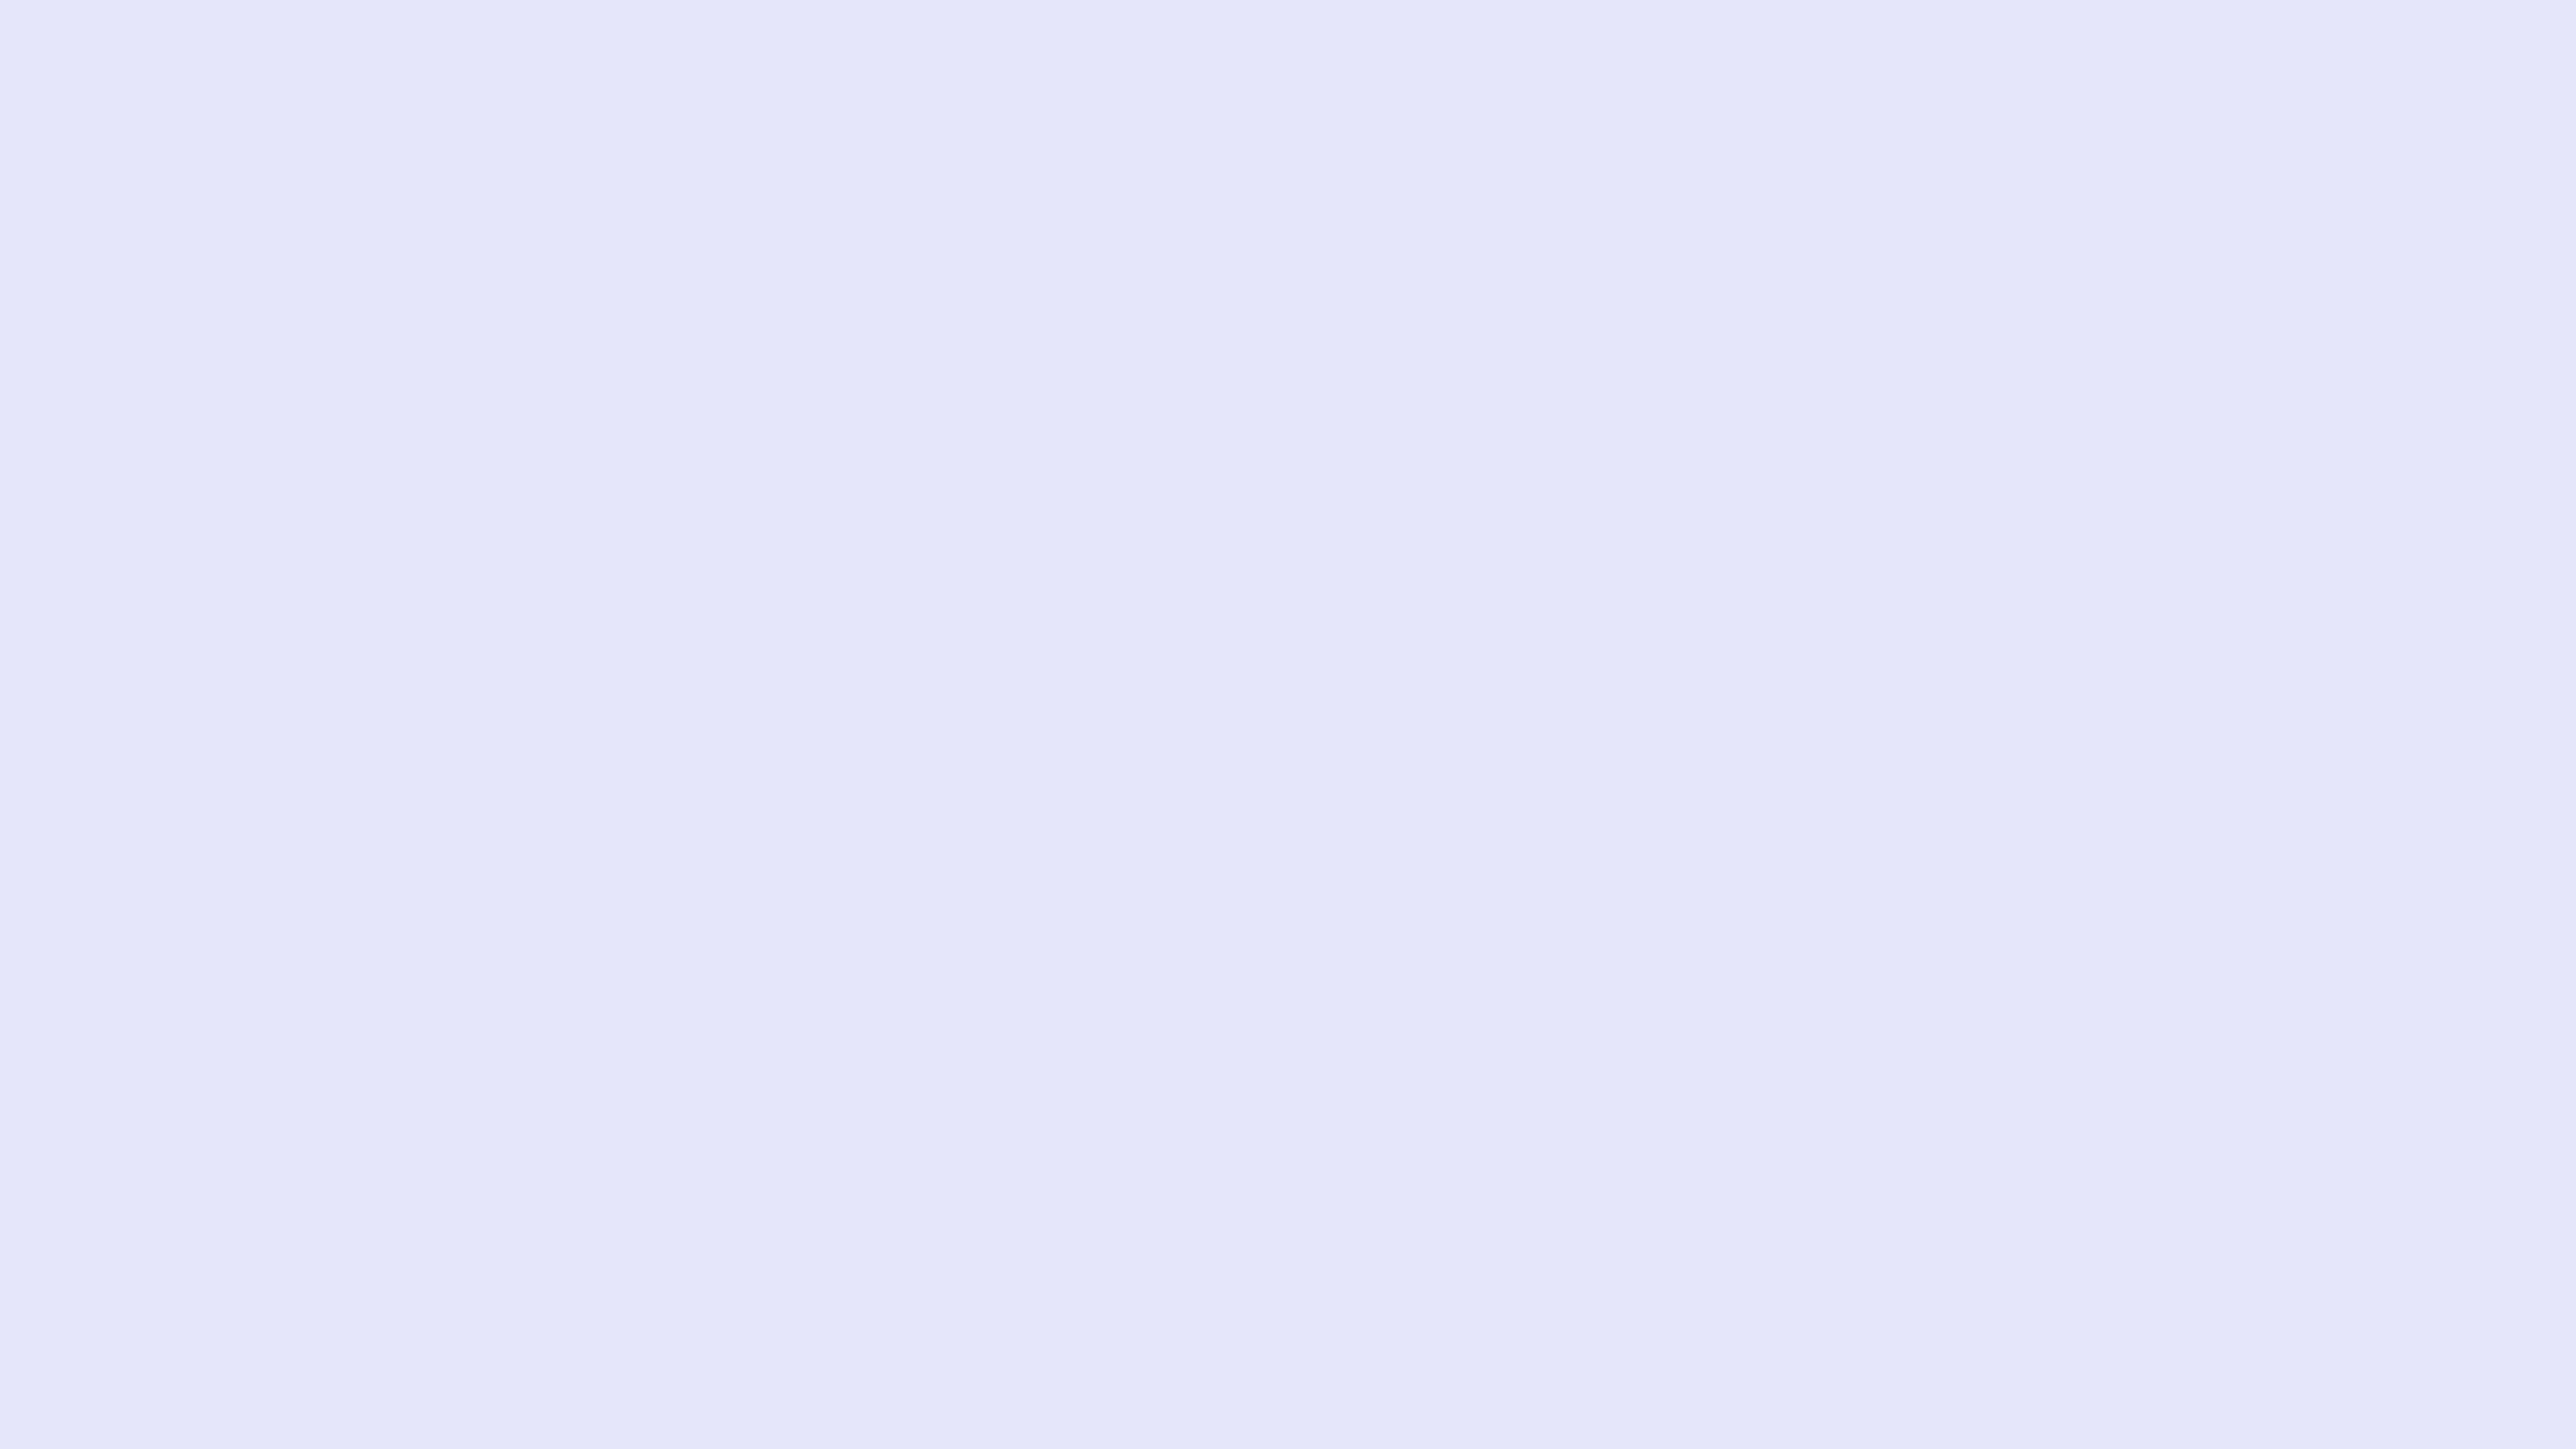 5120x2880 Lavender Web Solid Color Background